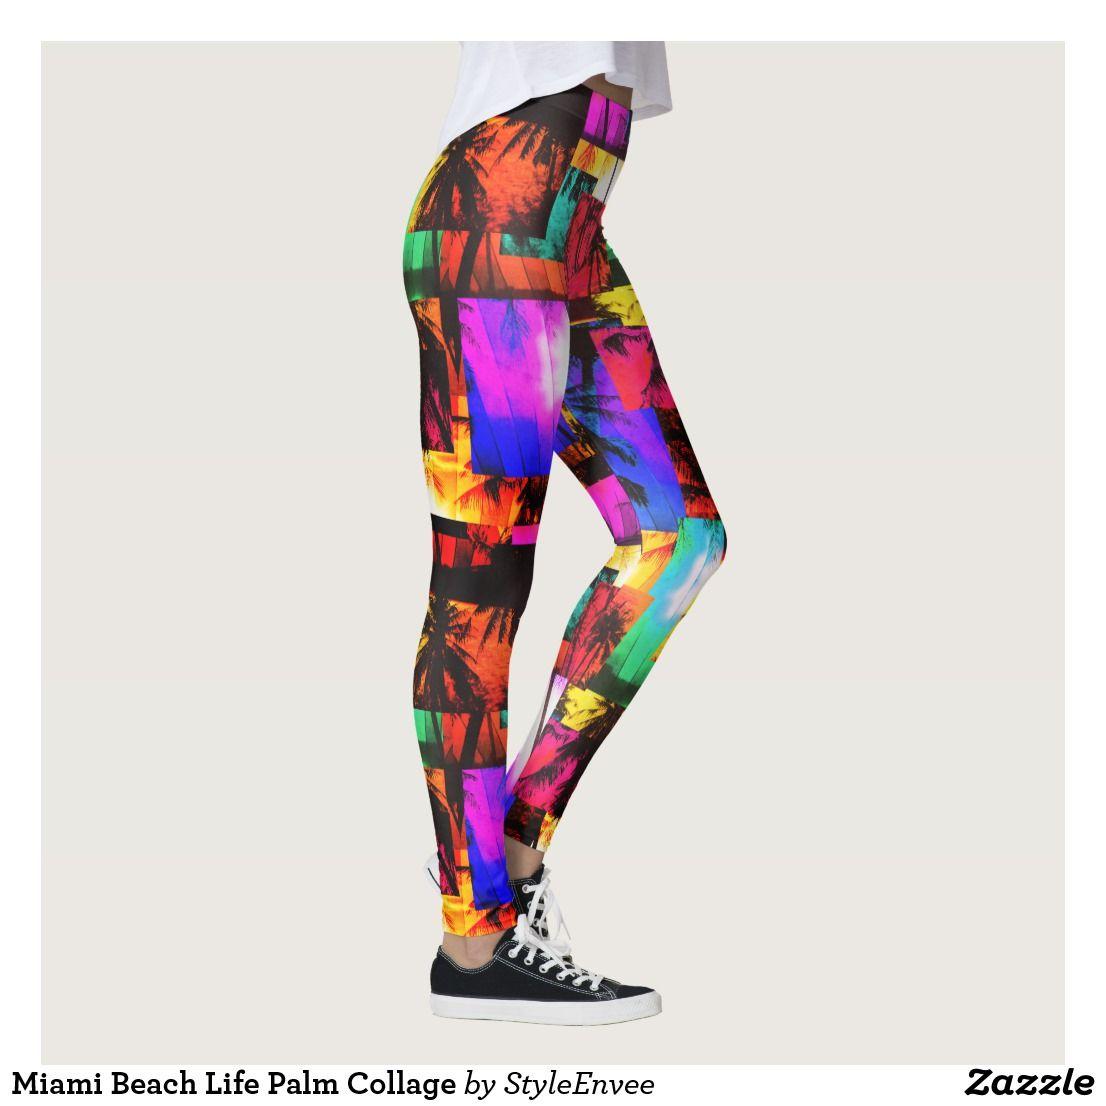 2c84e19f72af0 Miami Beach Life Palm Collage Leggings | Zazzle.com in 2019 ...